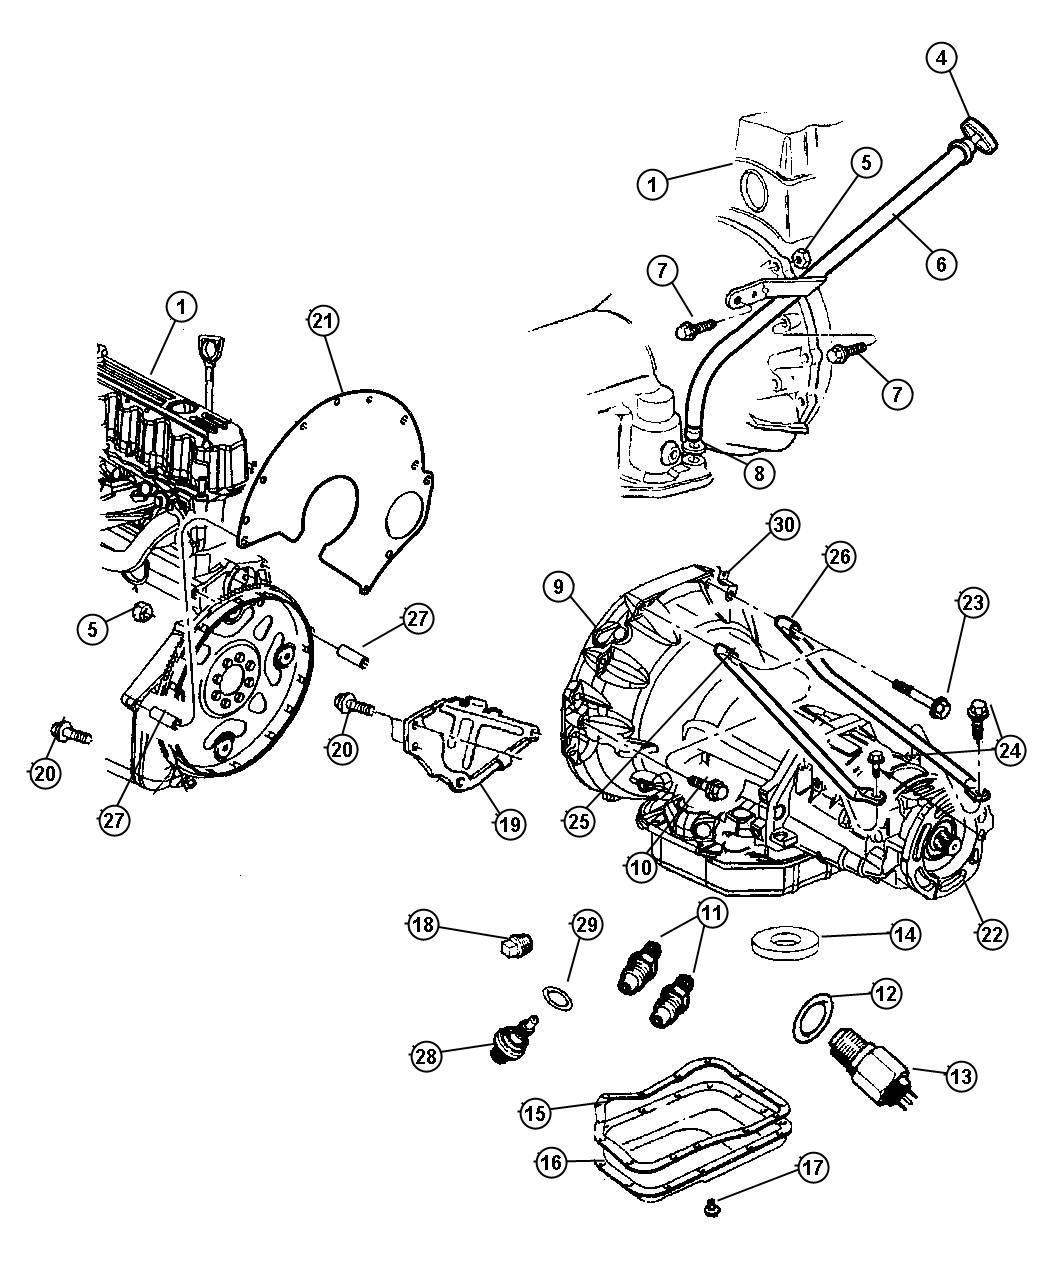 tags: #oil pan transmission 52118779ad#42rh transmission pan#42re  transmission governor pressure sensor#42re transmission case#42re  transmission gasket#42re